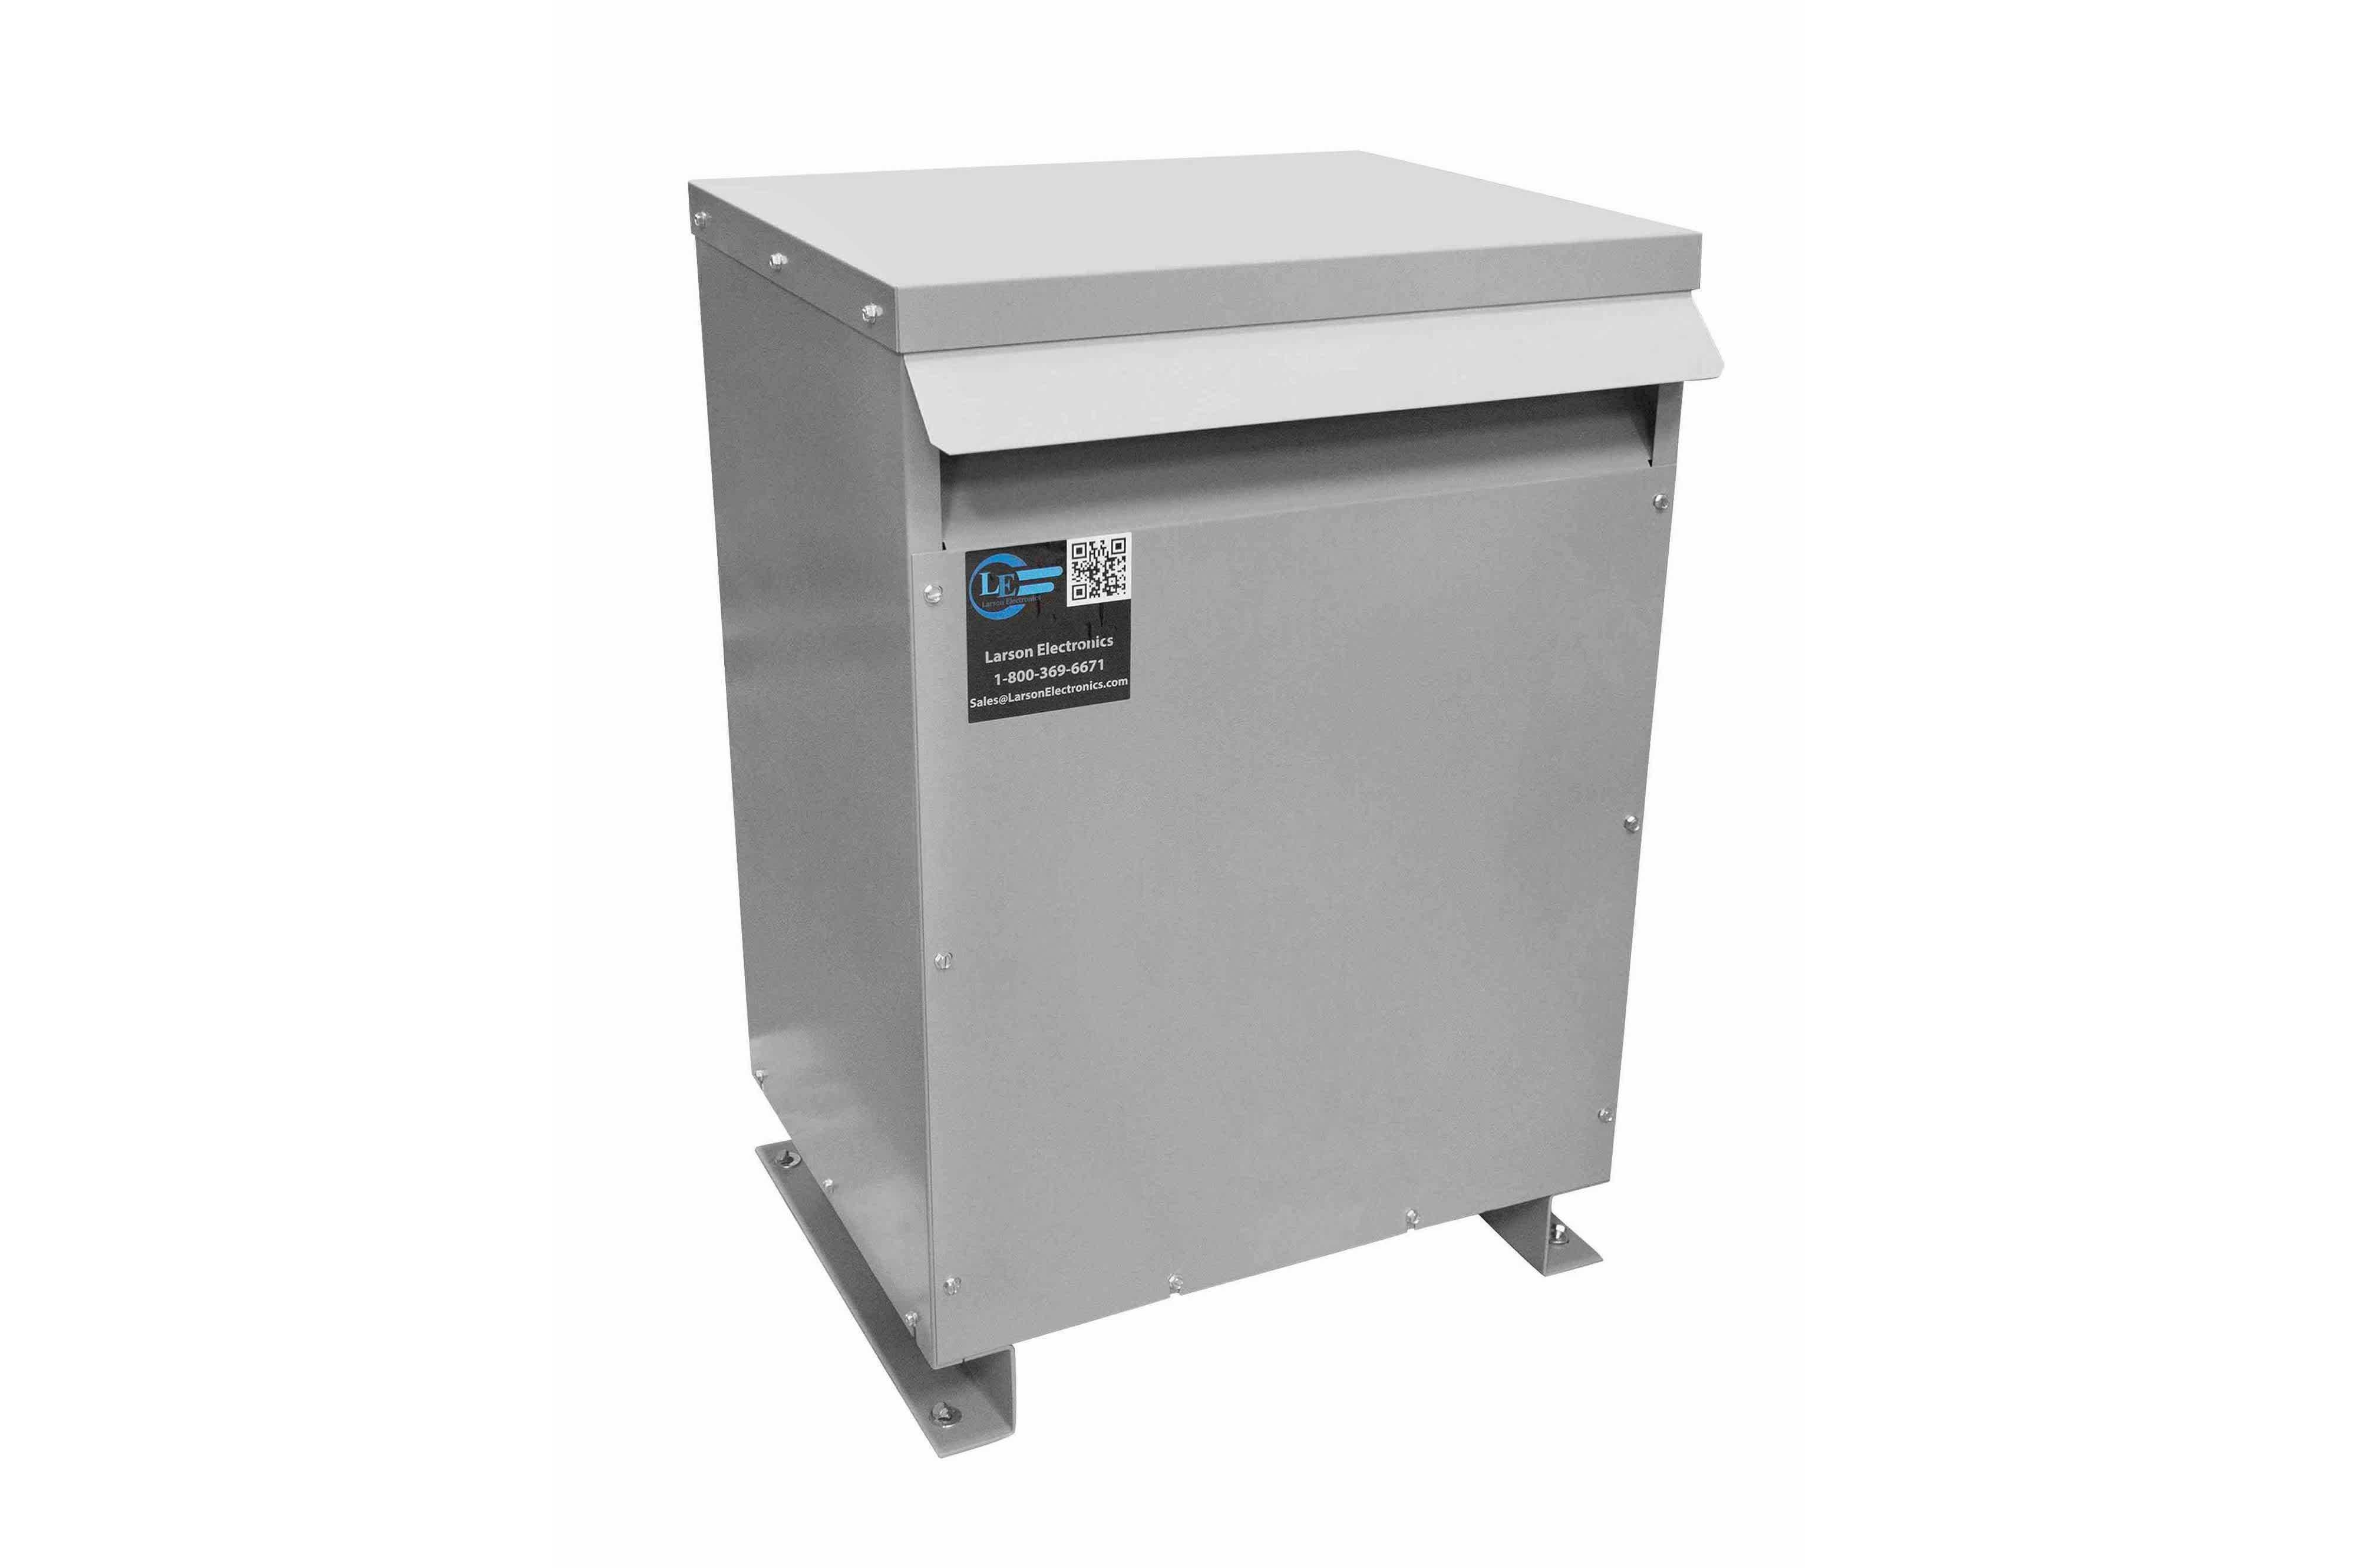 300 kVA 3PH Isolation Transformer, 380V Wye Primary, 480Y/277 Wye-N Secondary, N3R, Ventilated, 60 Hz